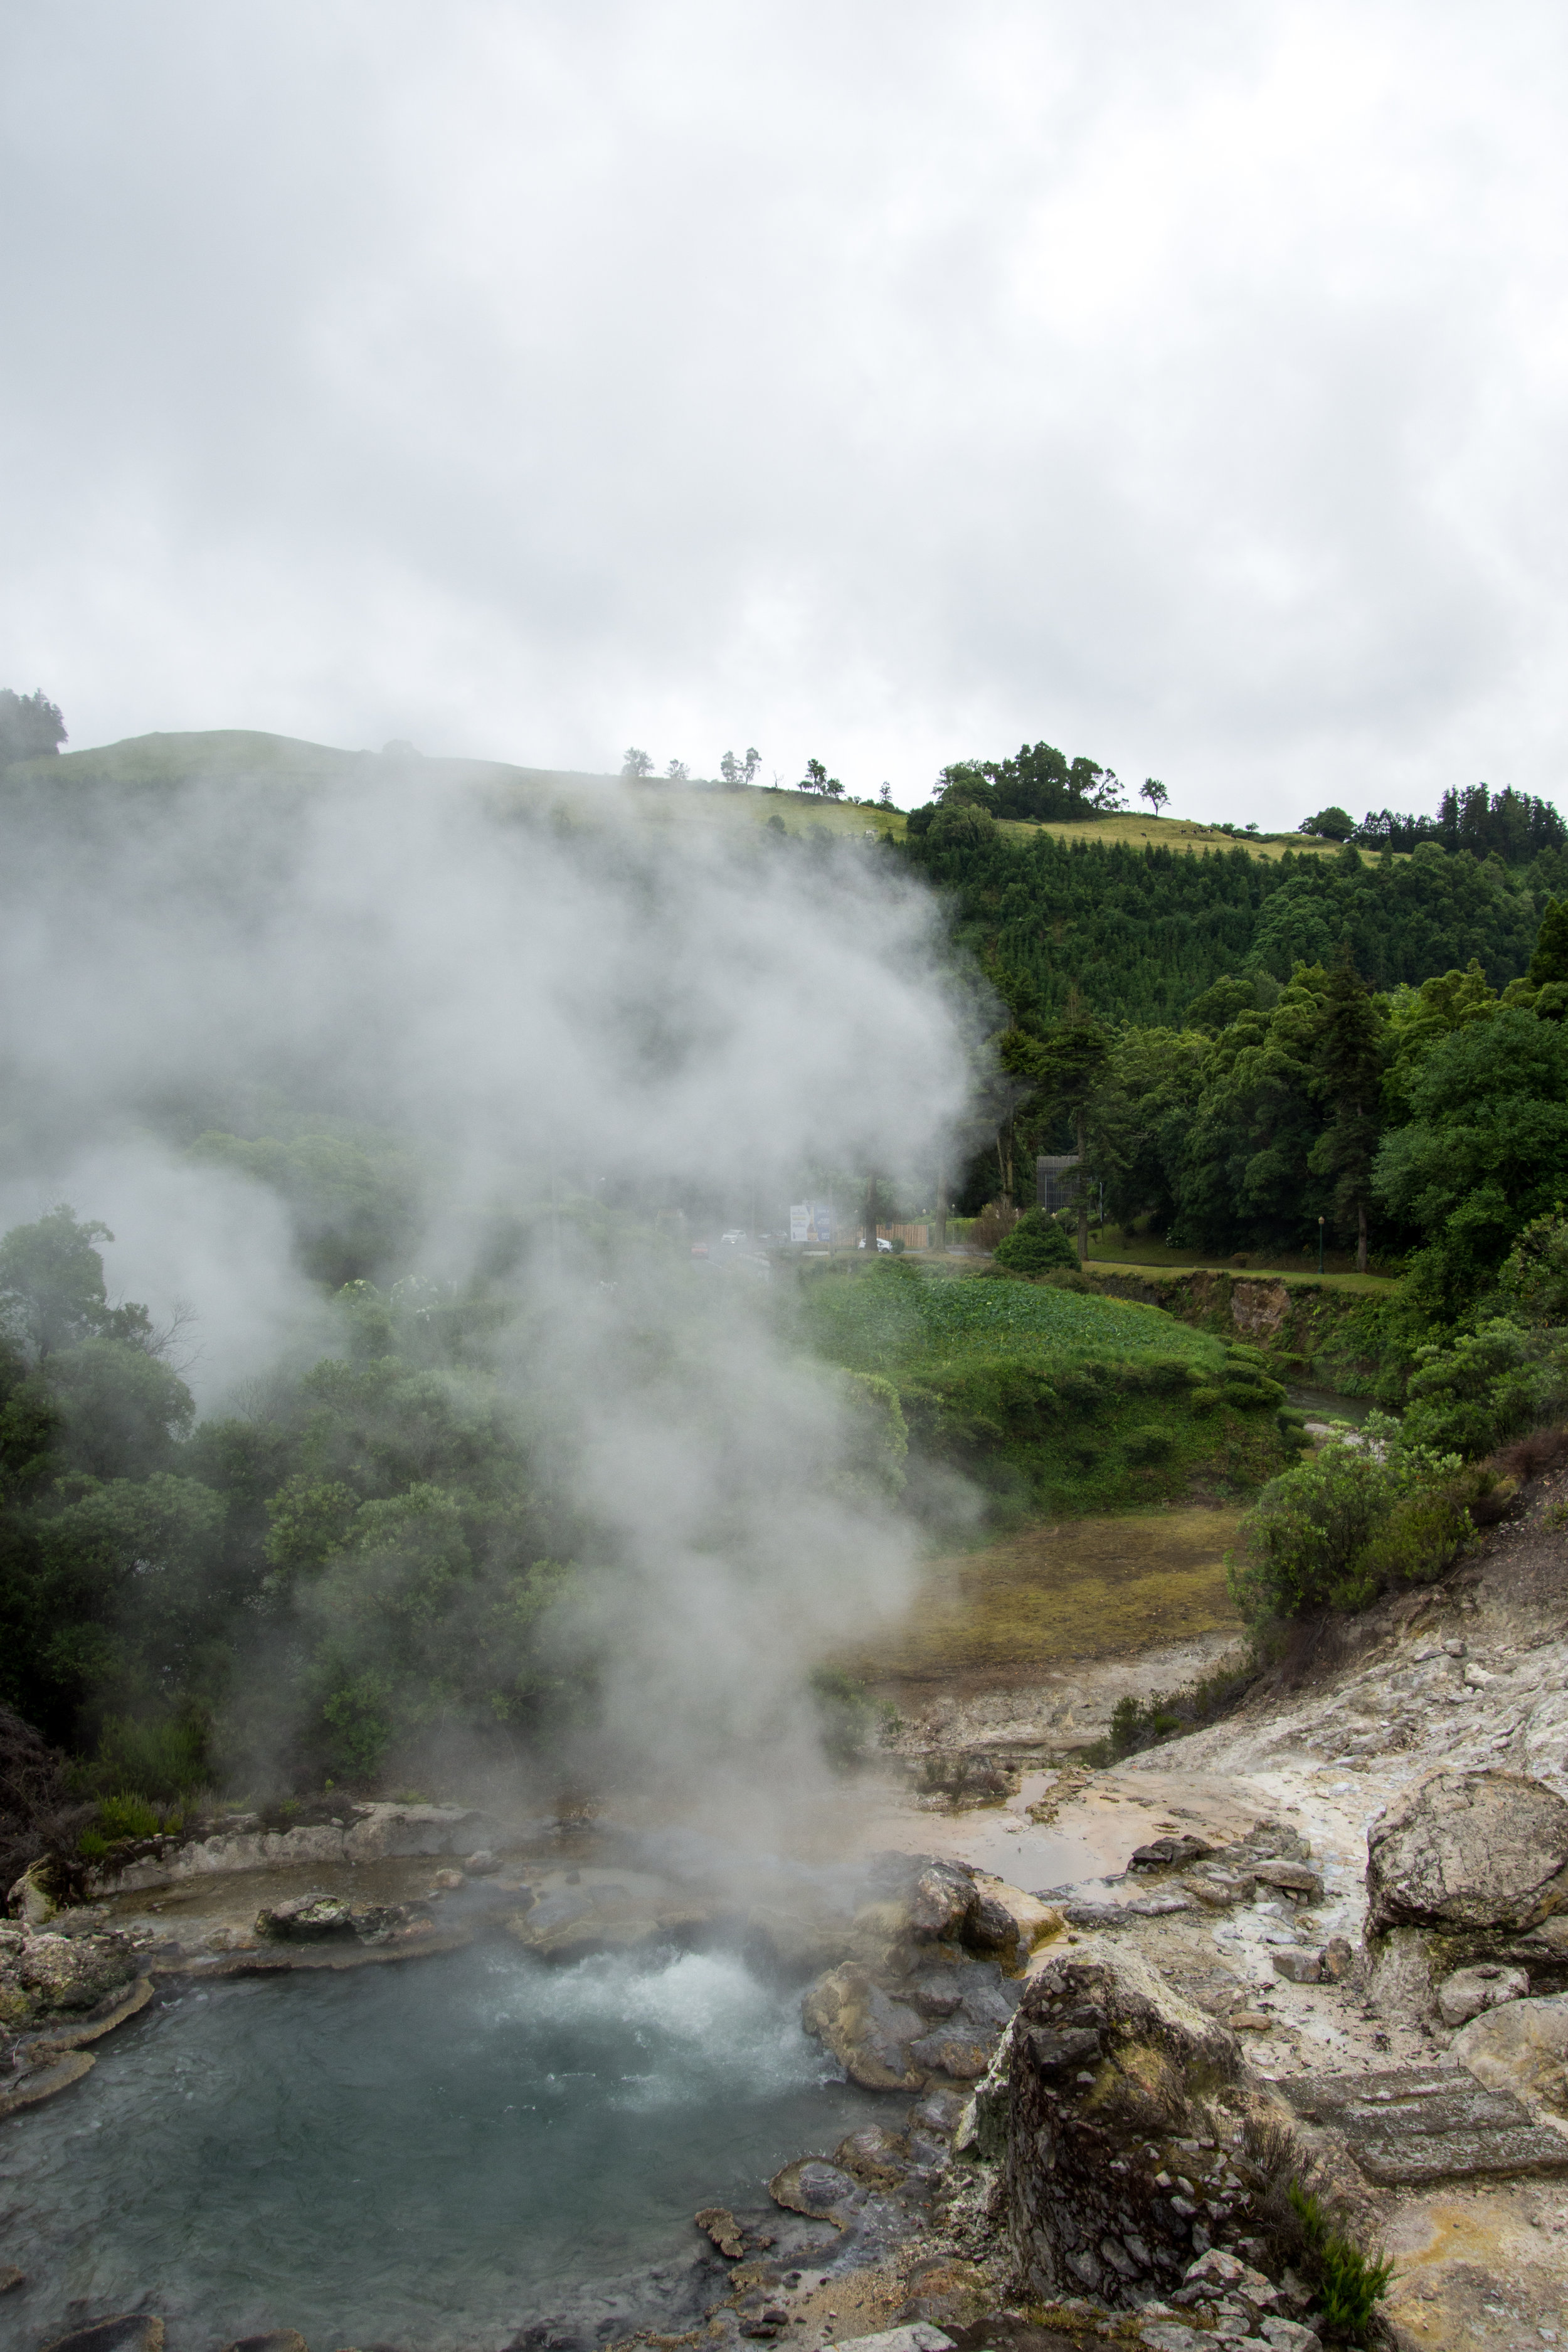 Caldeiras Vulcânicas in Furnas on Sao Miguel Island